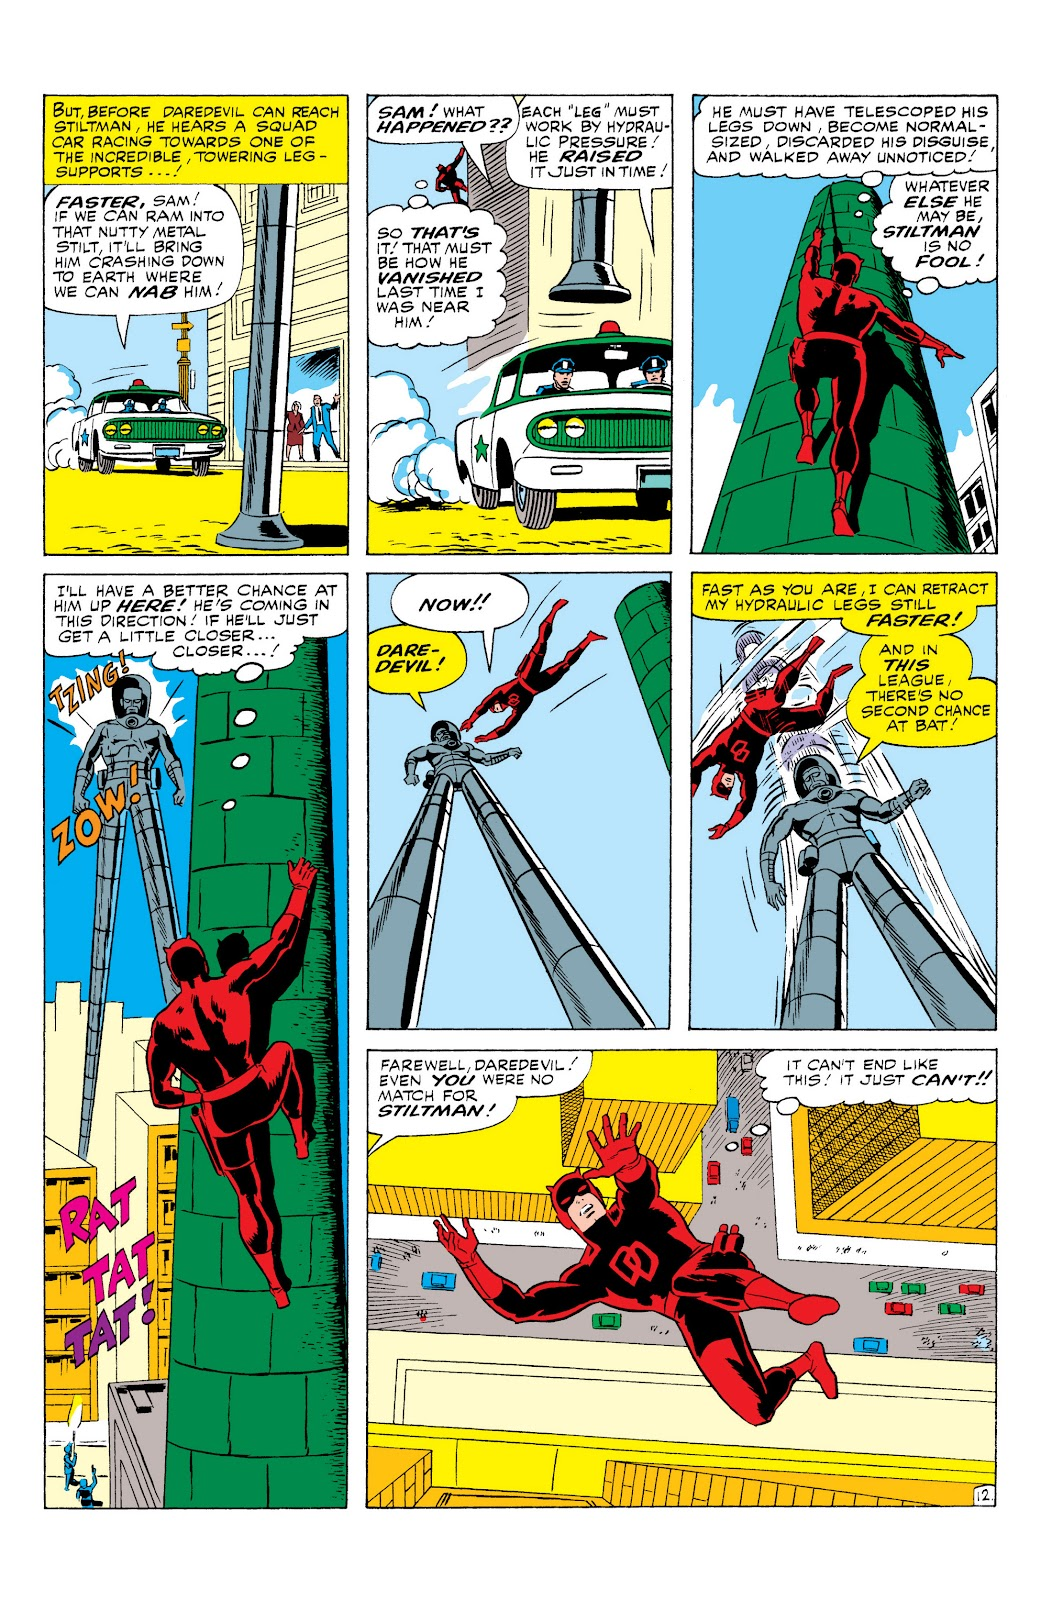 Read online Marvel Masterworks: Daredevil comic - Issue # TPB 1 (Part 2) - 76